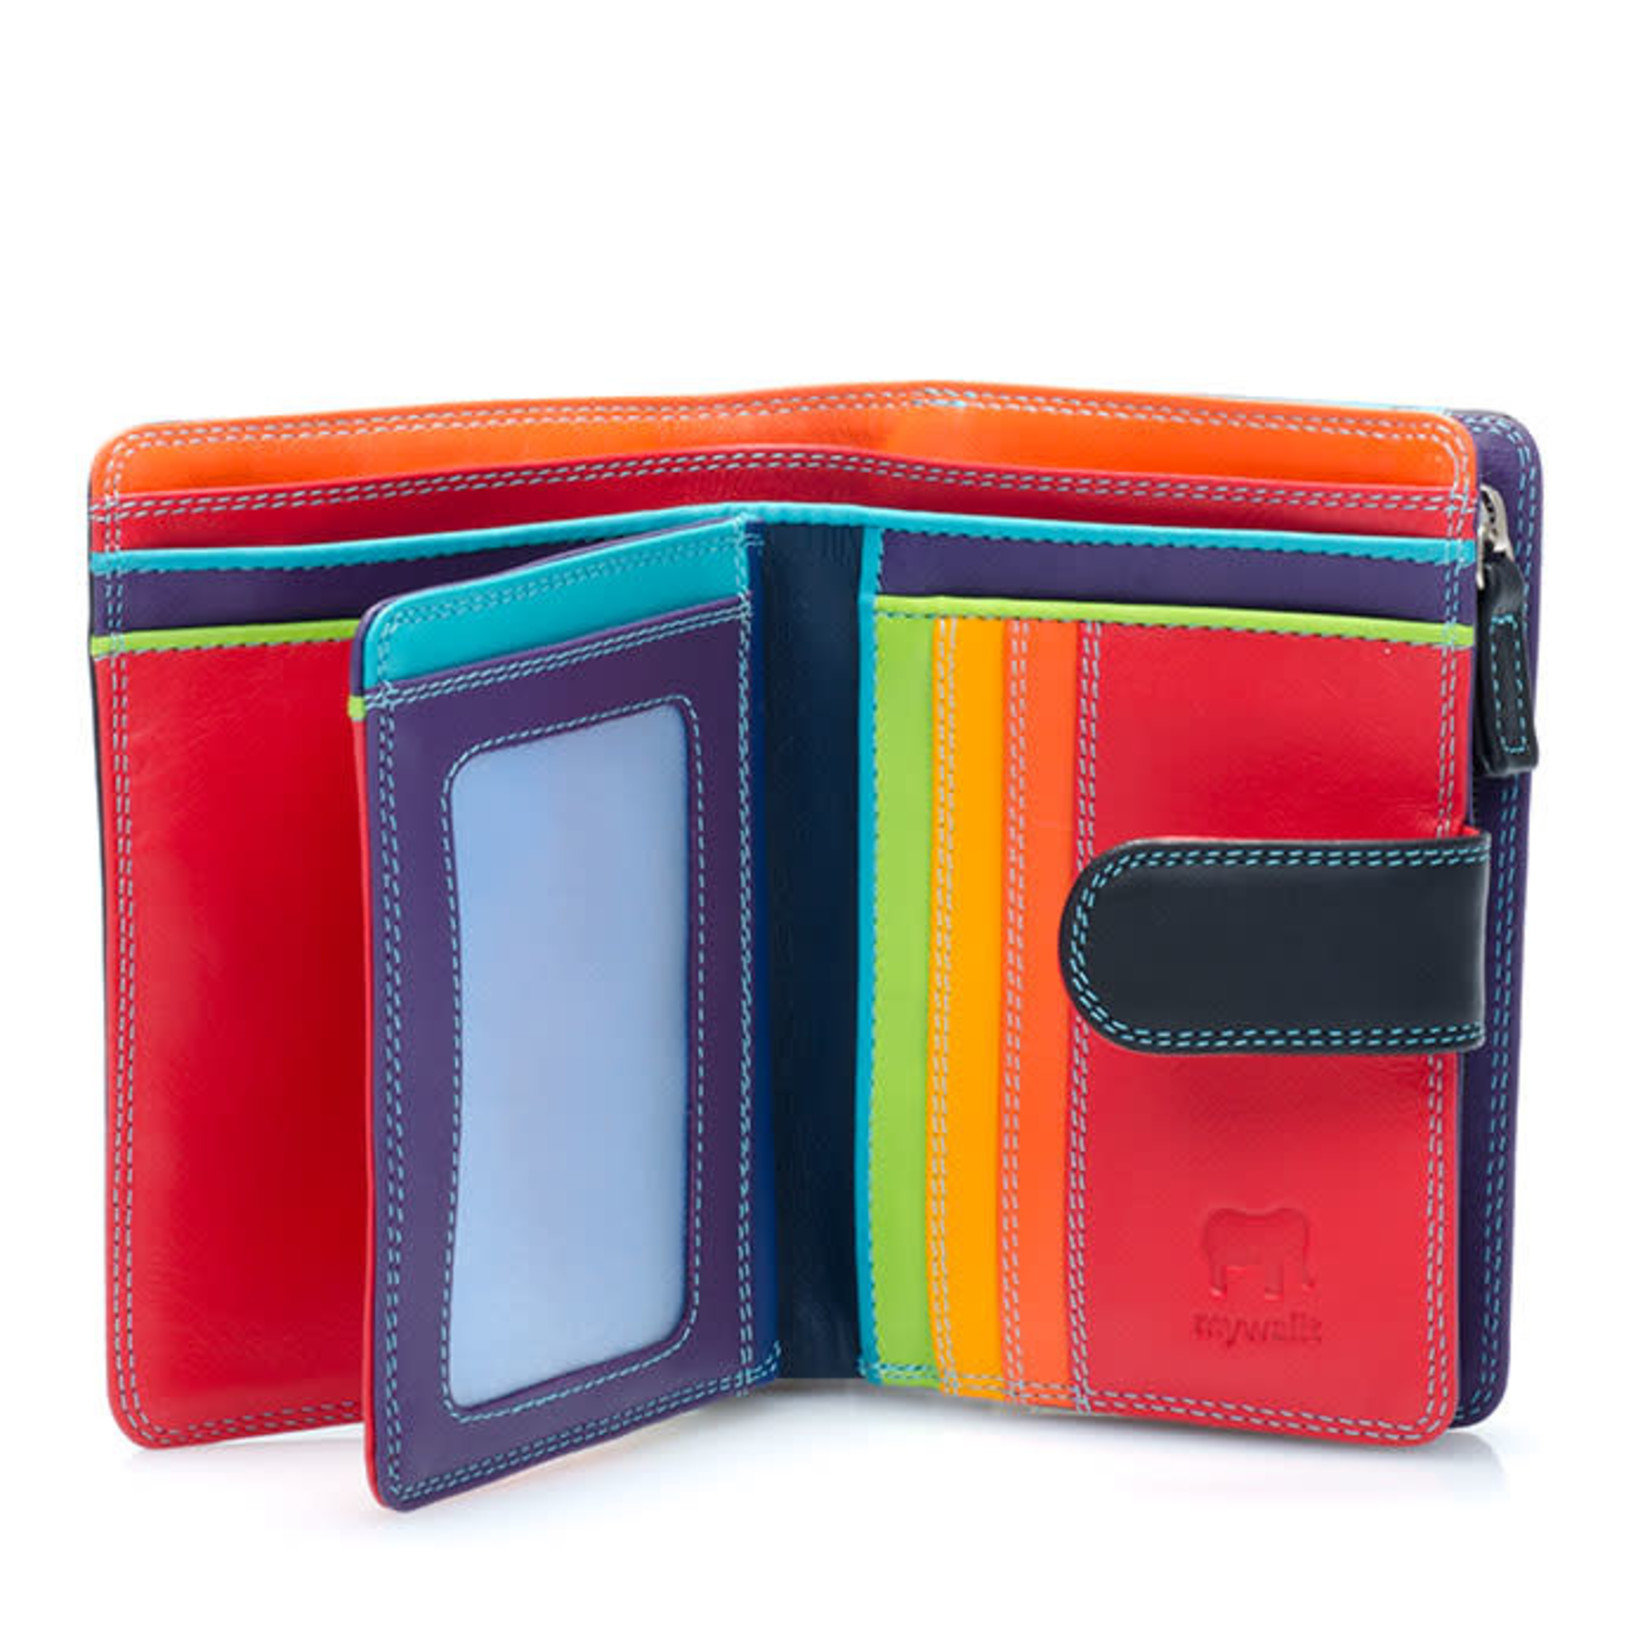 MyWalit Medium 10 C/C Wallet w/Zip Purse Black/Pace